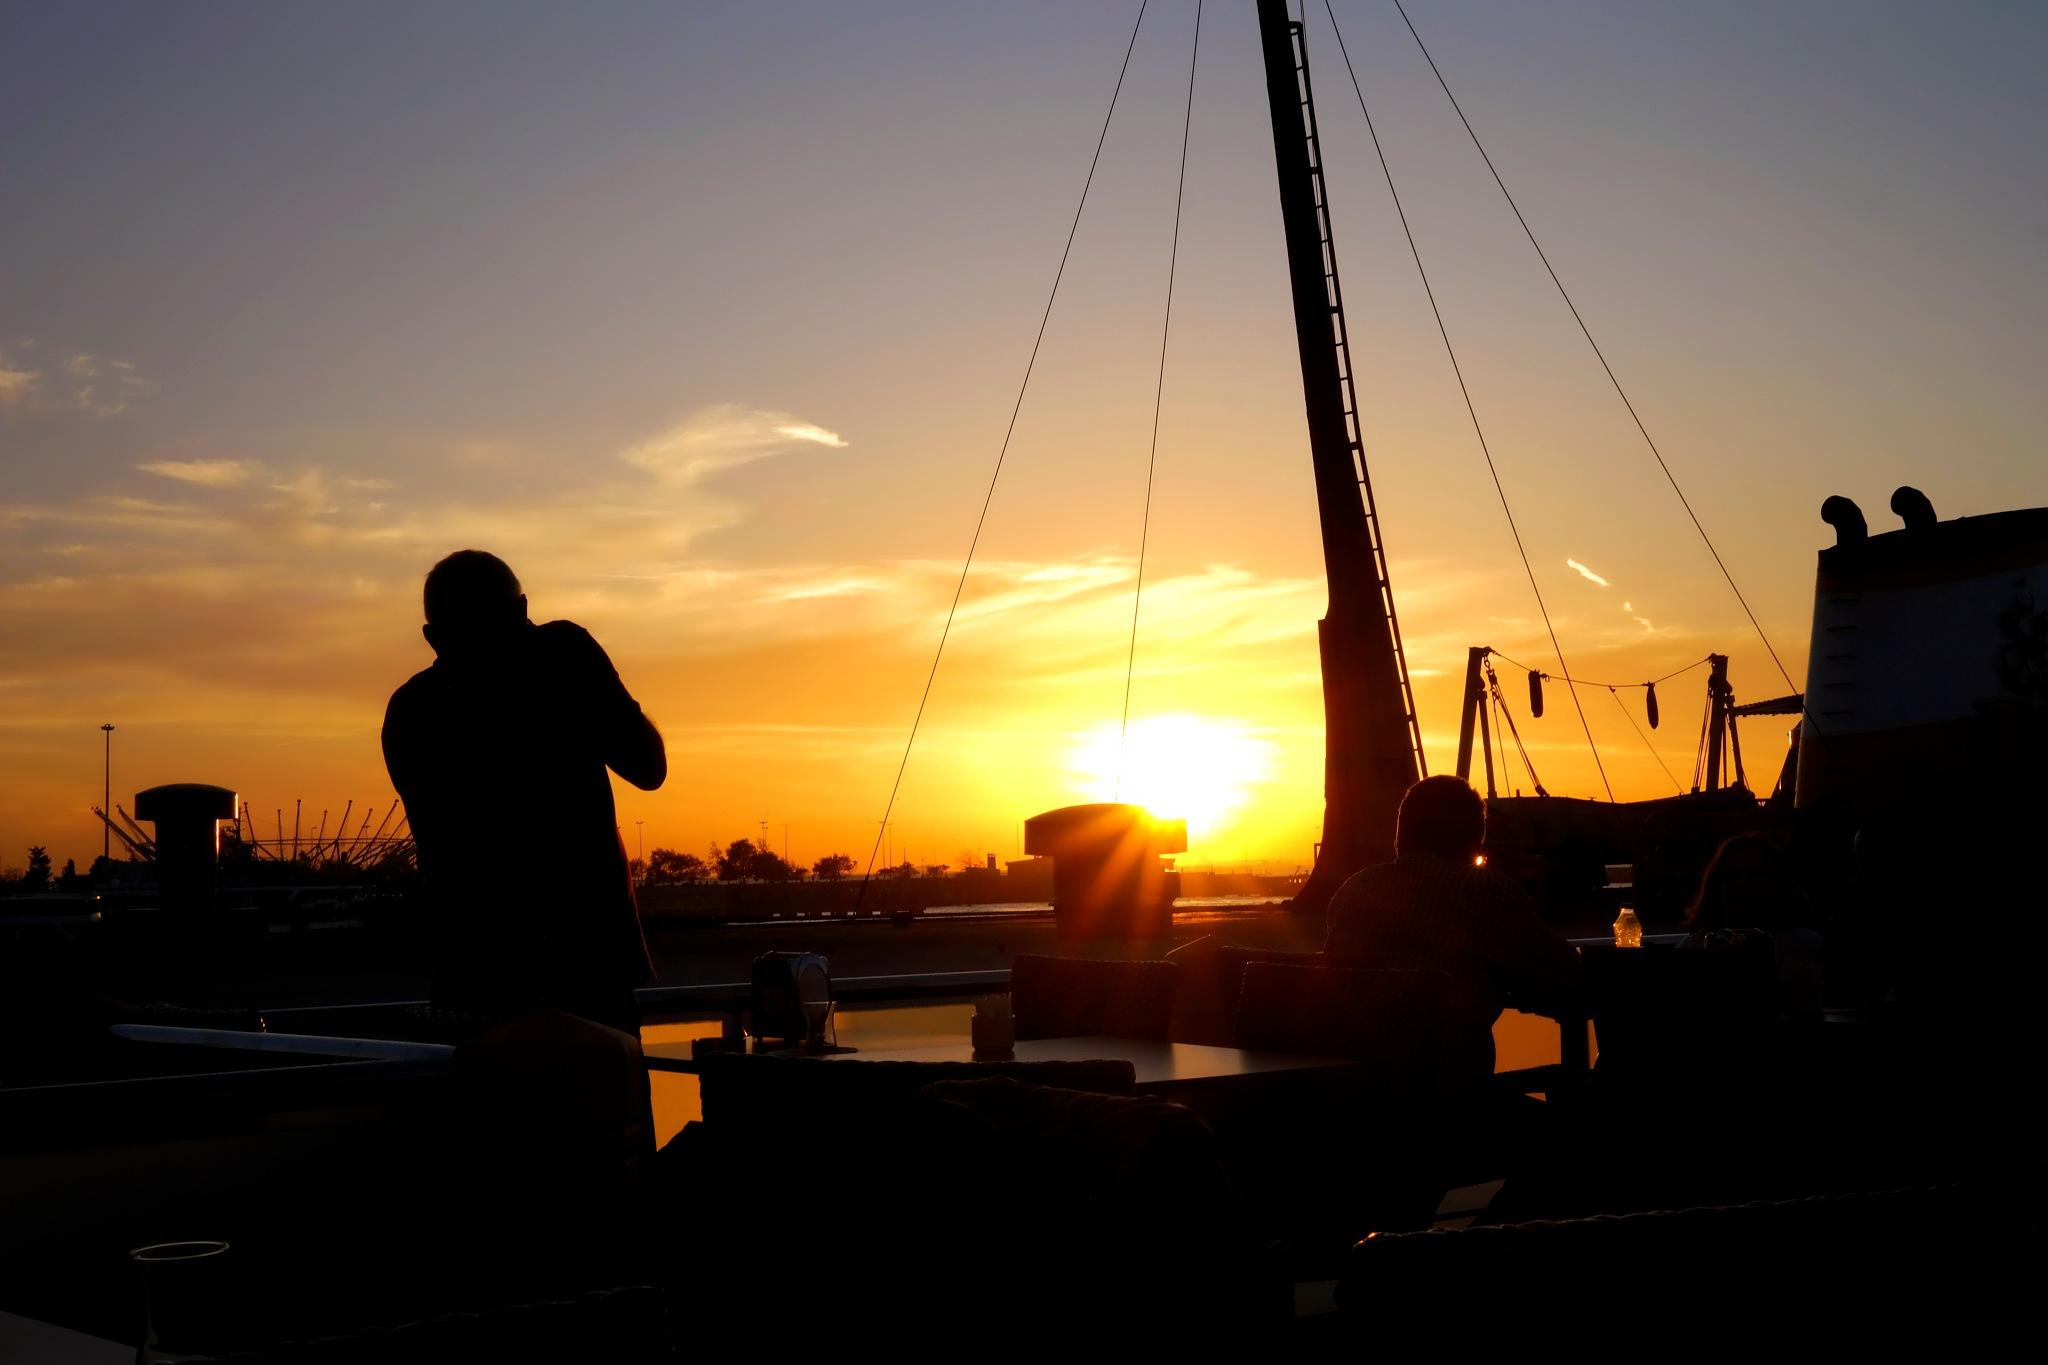 shooting sunset by Muhsin Özcan